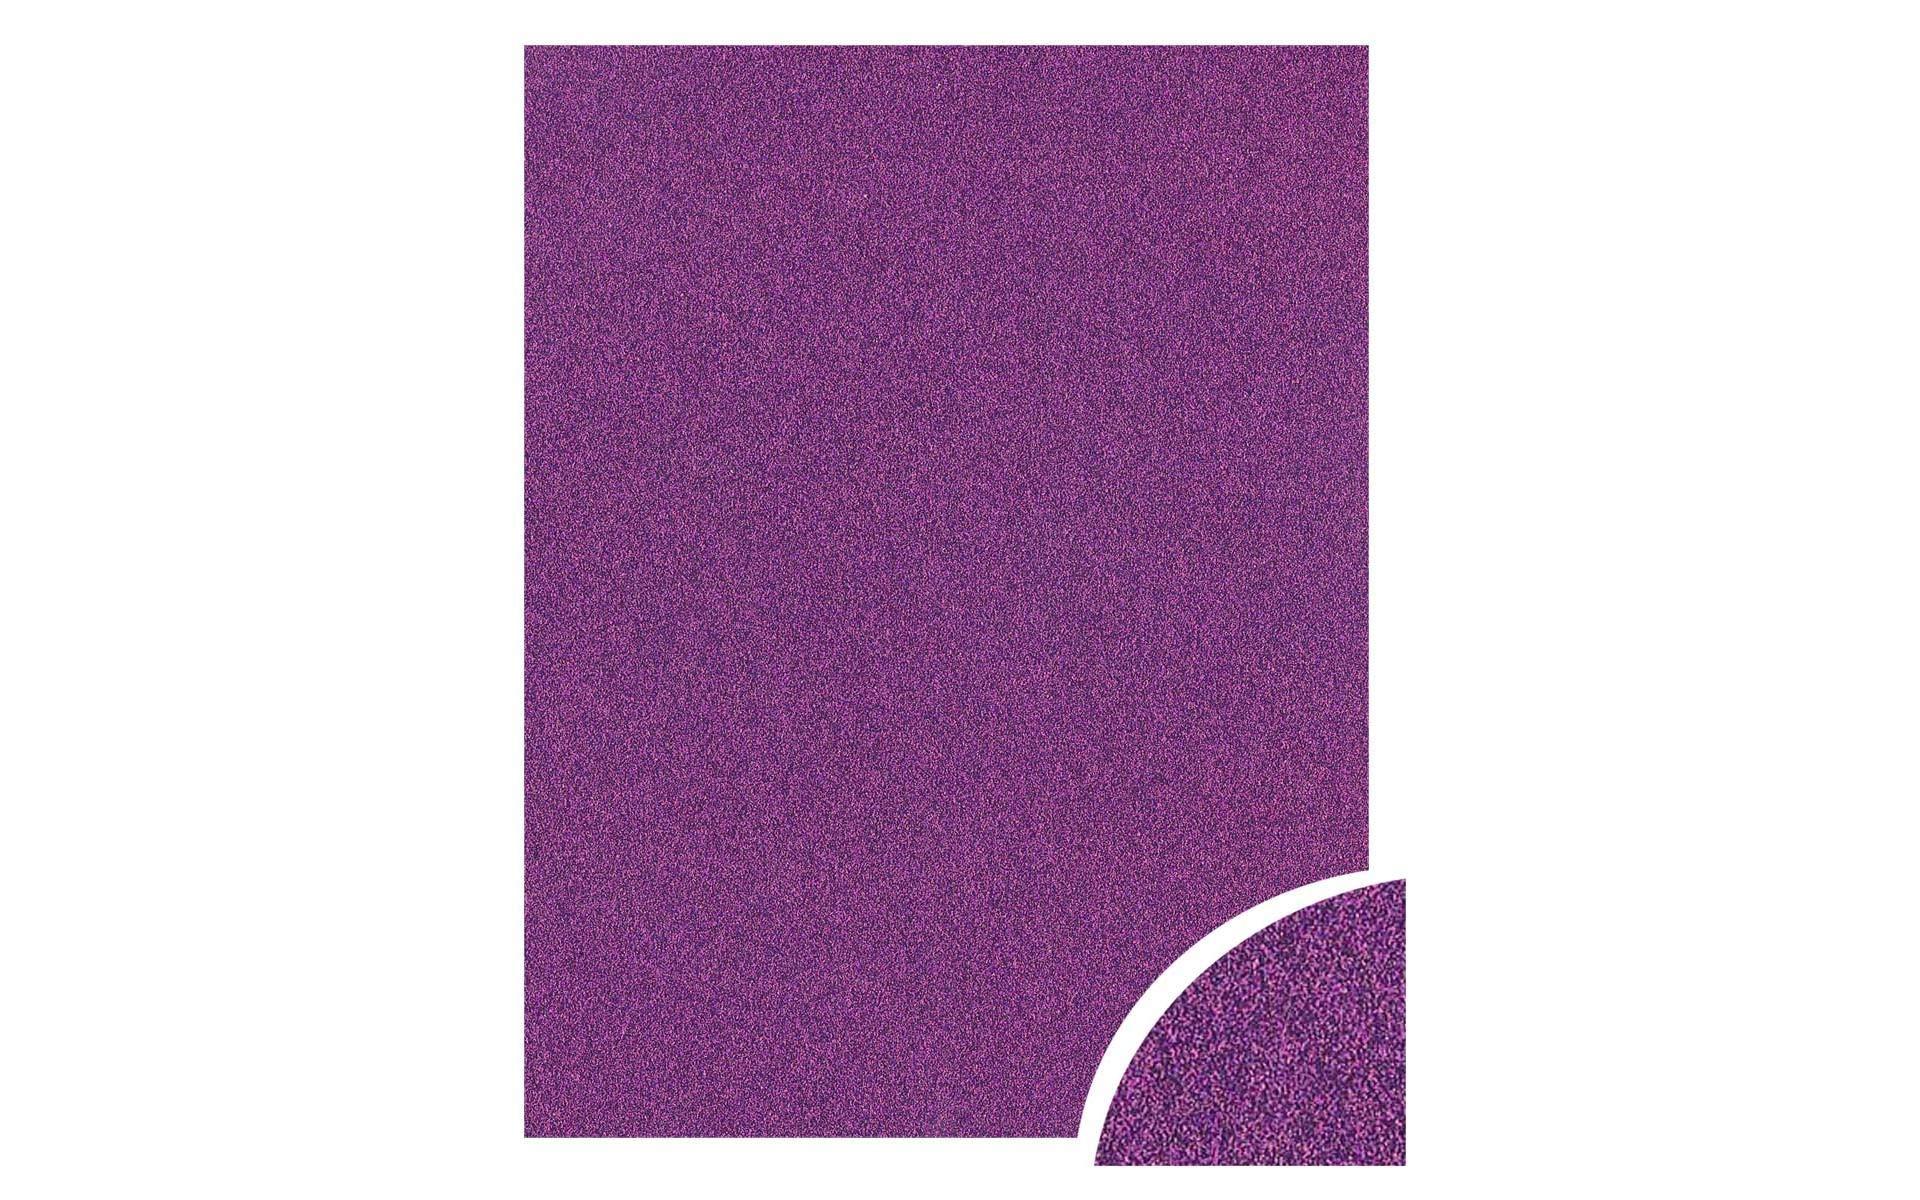 Paper Accents Cdstk Glitter 22x28 85lb Grape Jam UPC